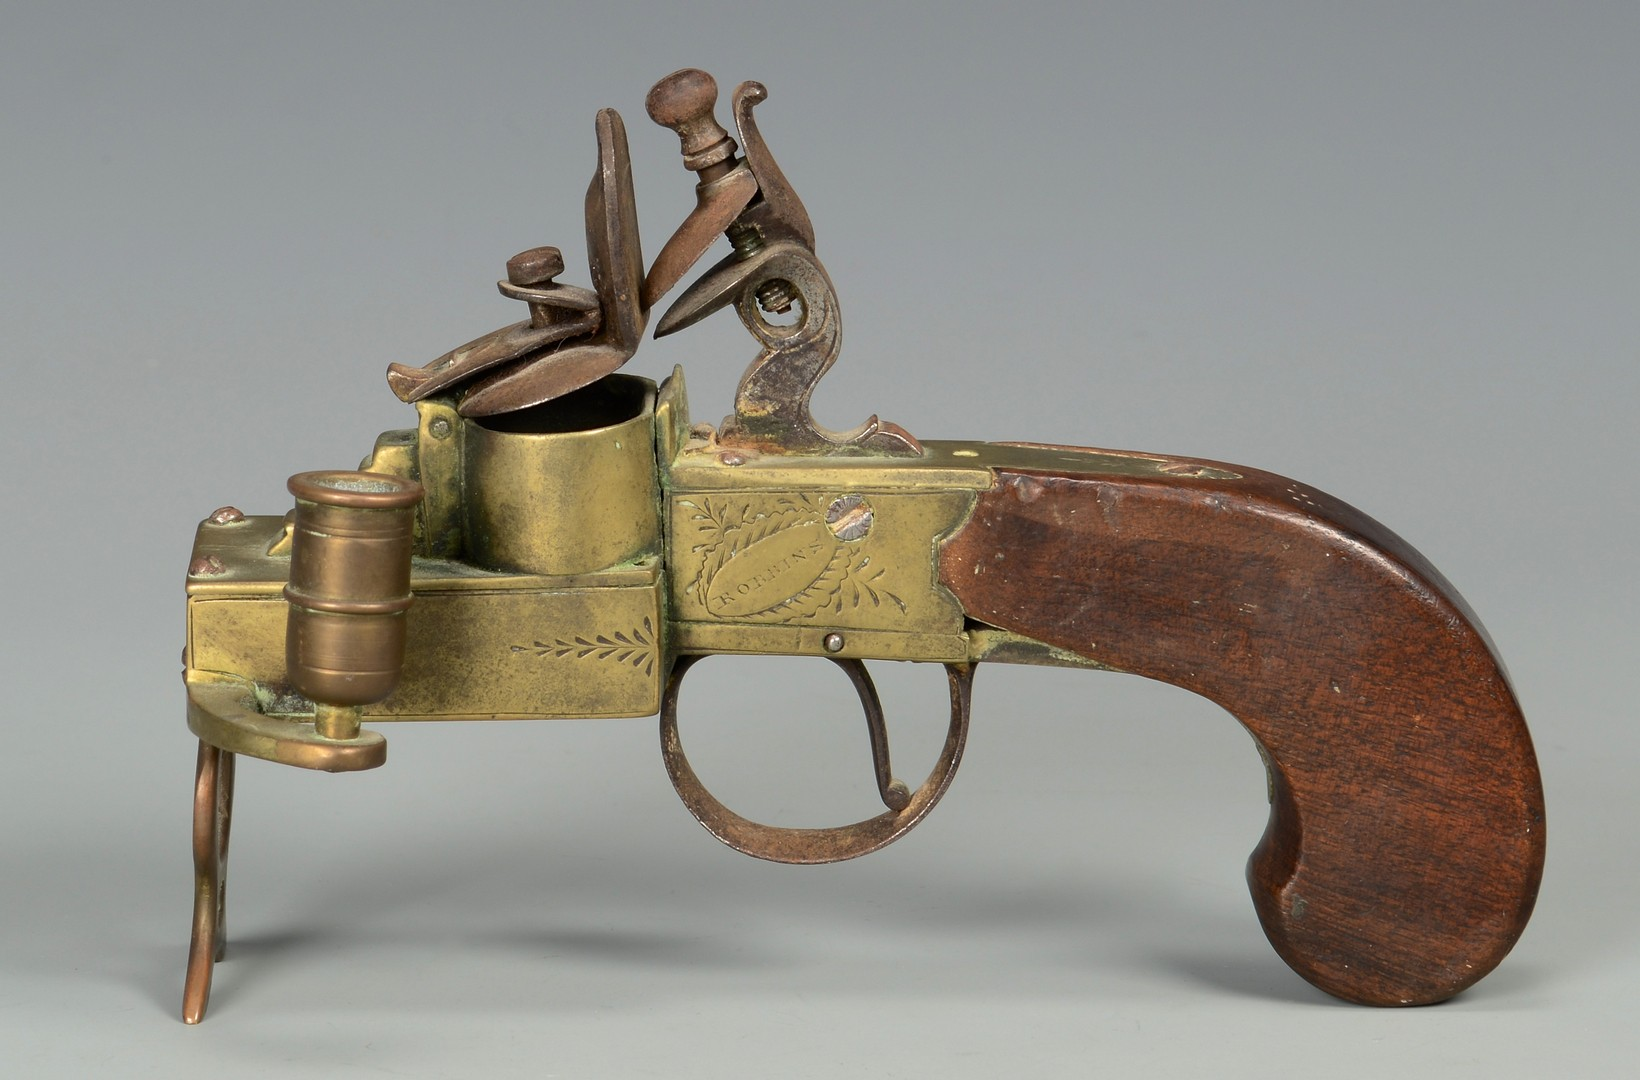 Lot 190: Flintlock Pistol Tinder Lighter and Large Flintlock Mechanism, 2 items